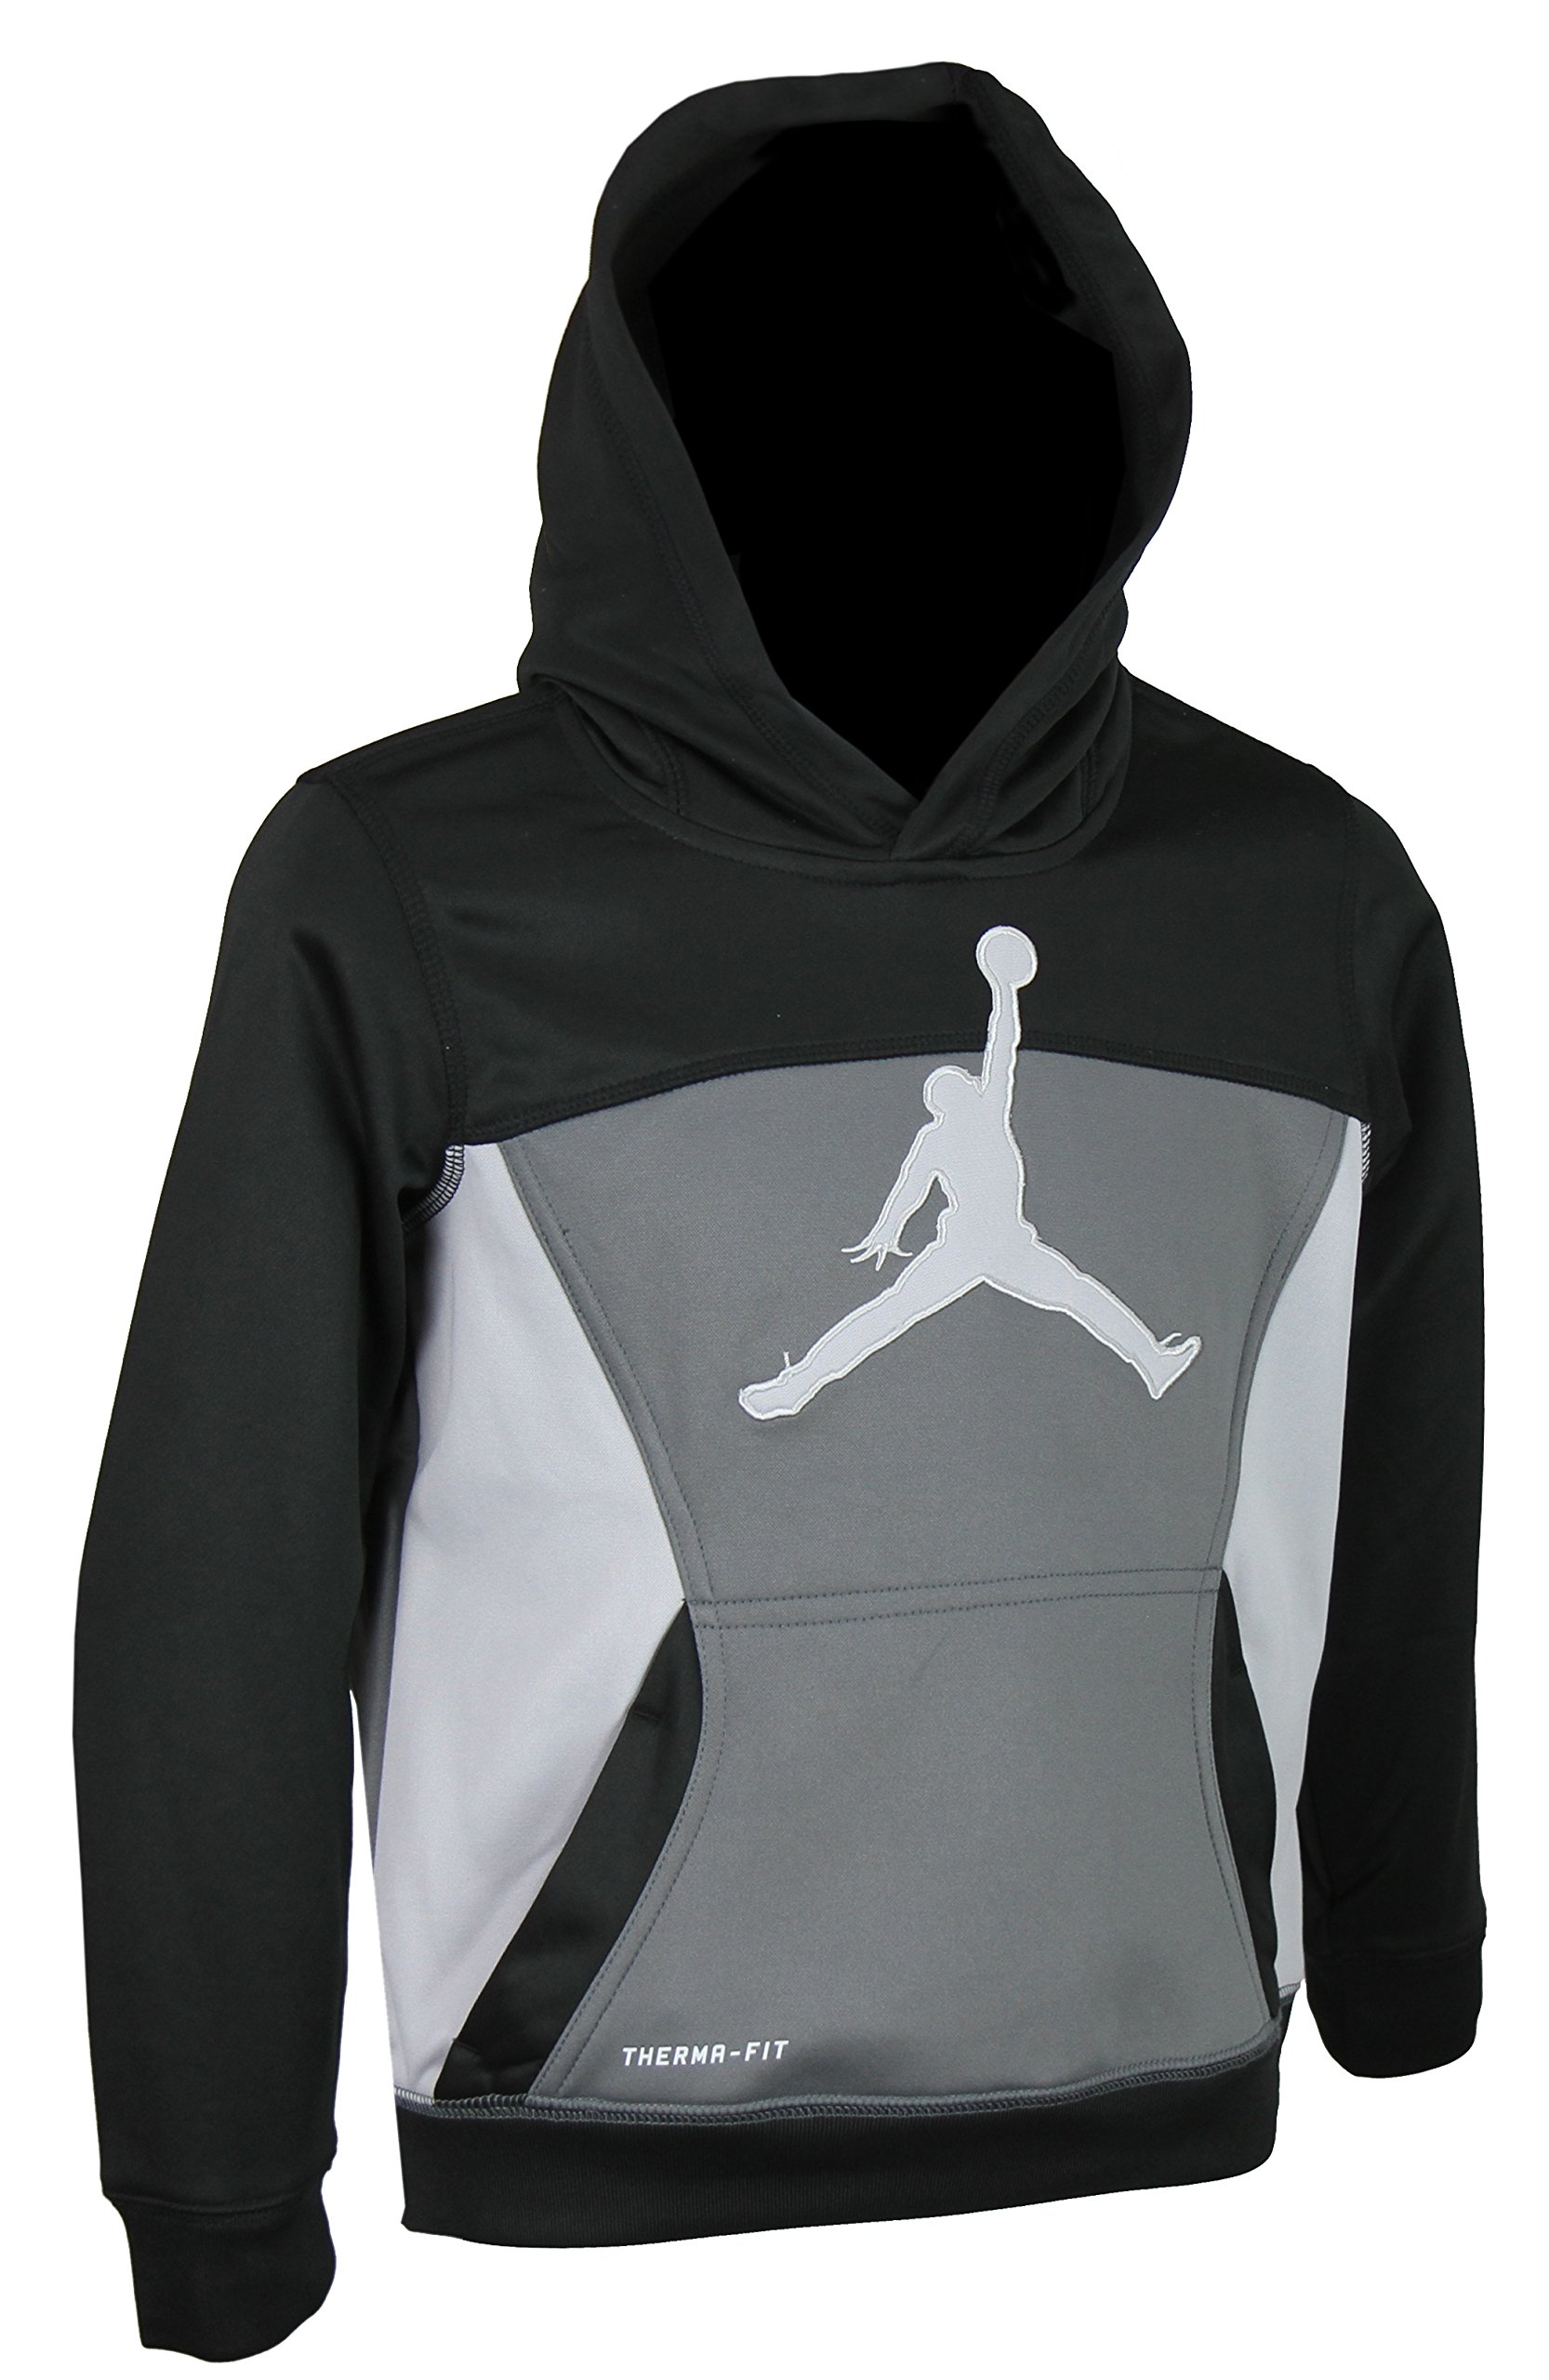 Jordan Nike Boys Air Jumpman Full Zip Therma-fit Hoodie - Black, Dk Grey (Size 7)